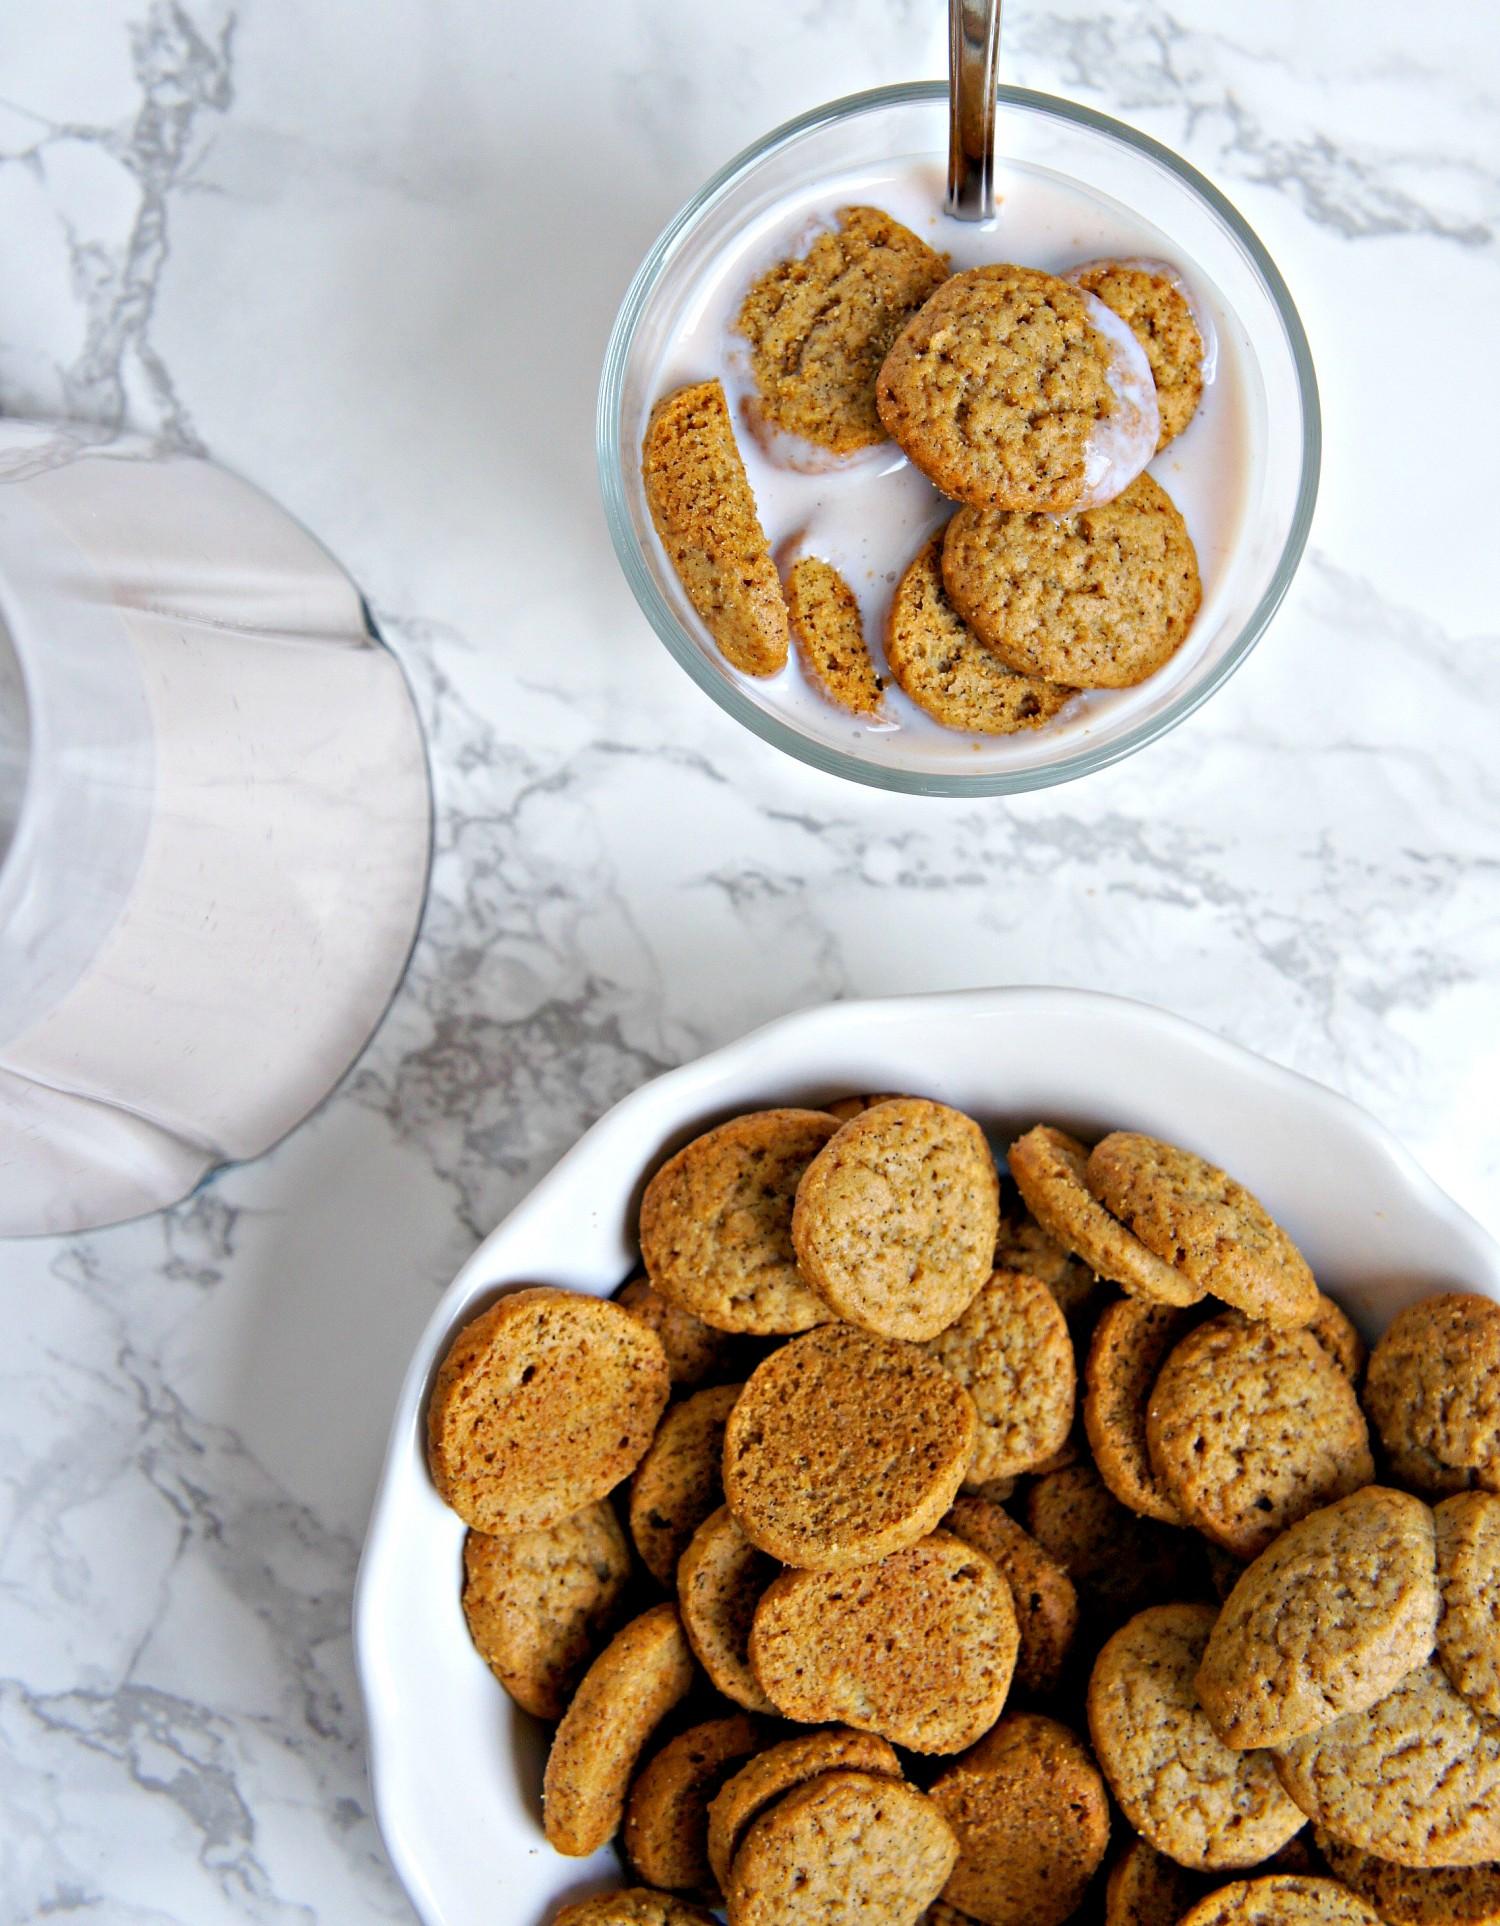 De bedste glutenfrie kammerjunker og den bedste veganske koldskål - Cathrineyoga - 7